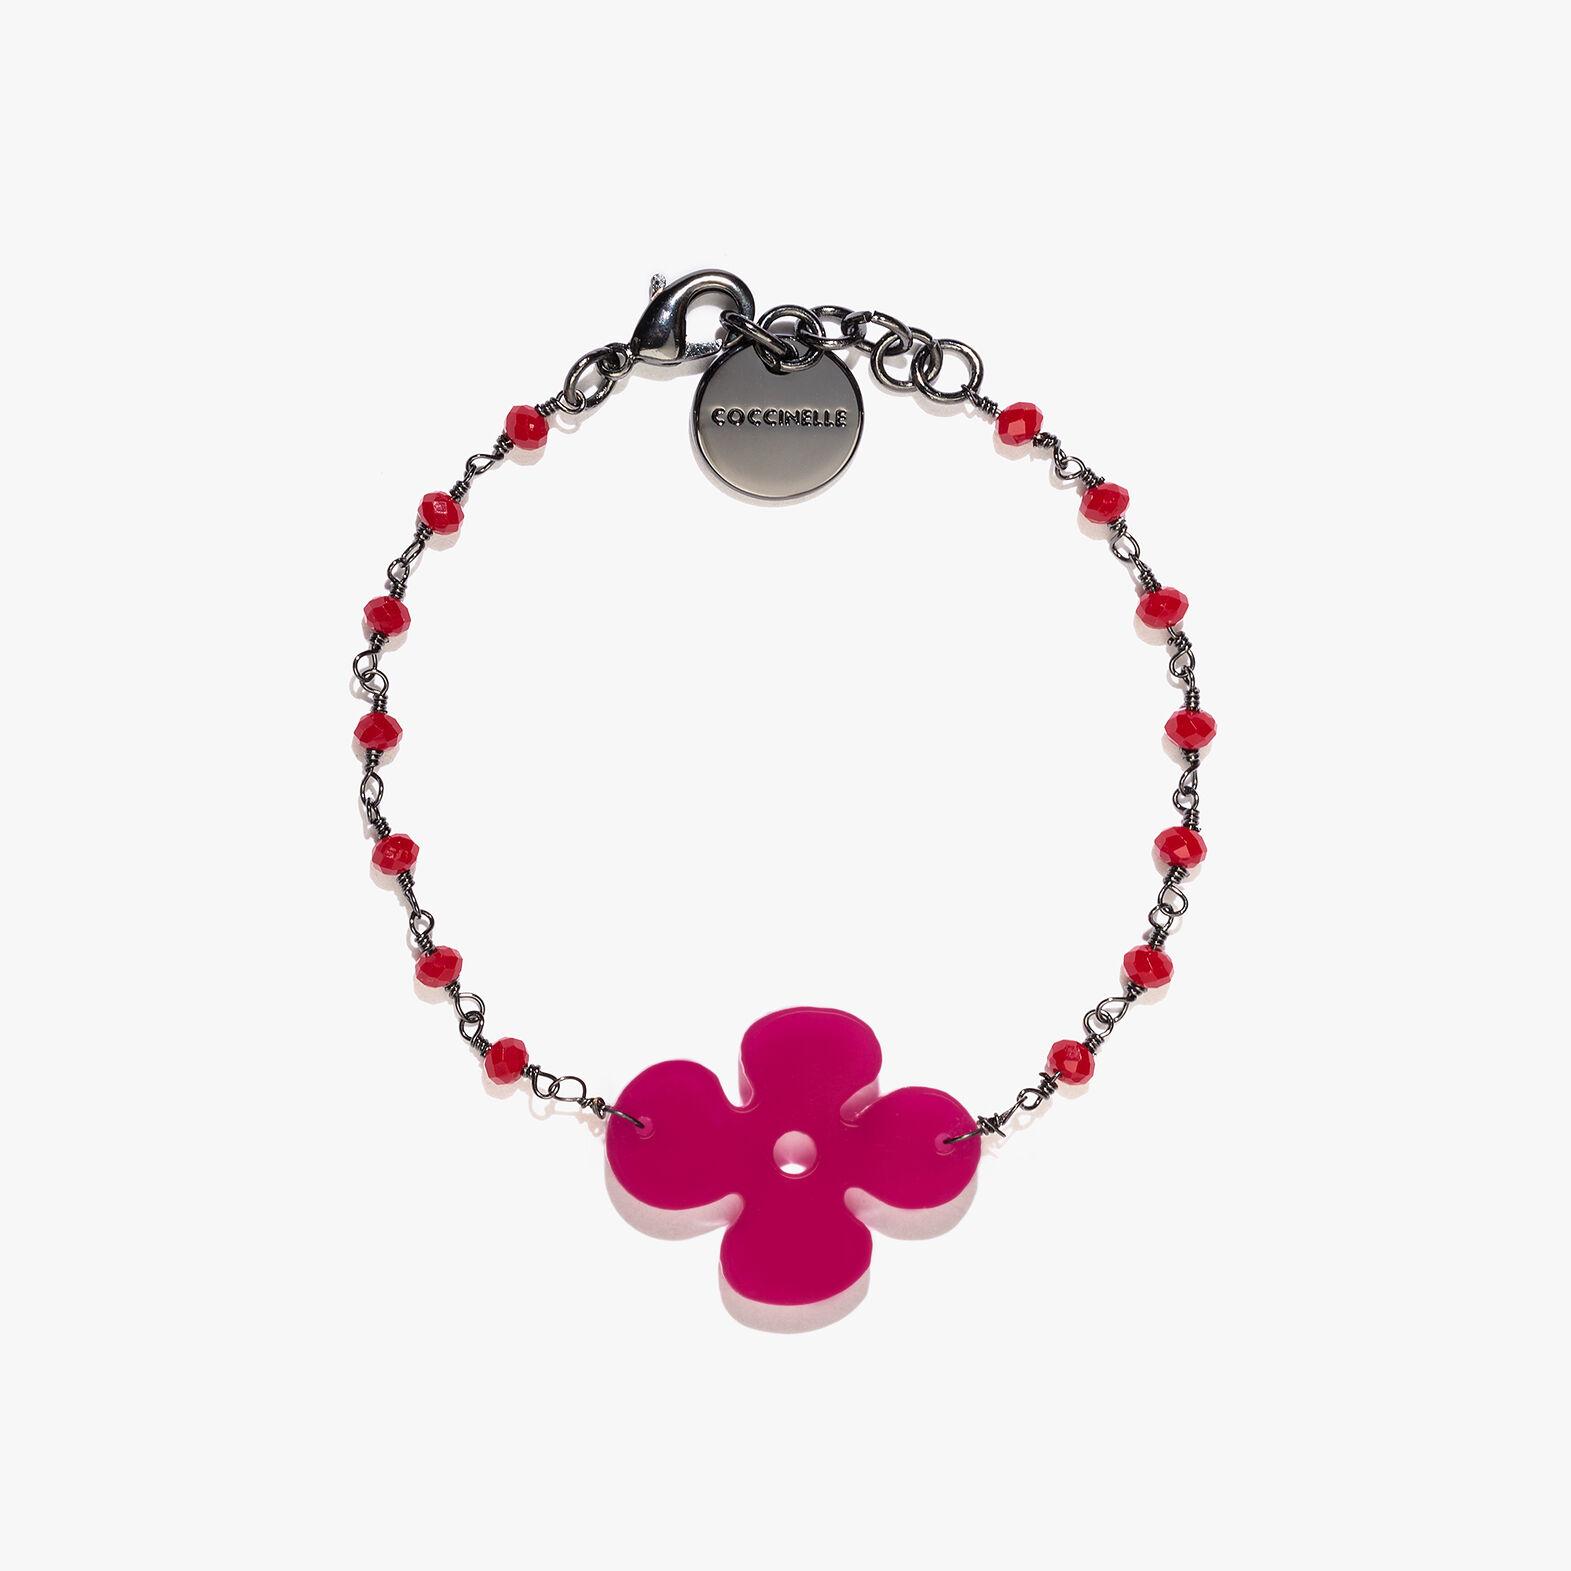 Plexiglas and crystal bracelet